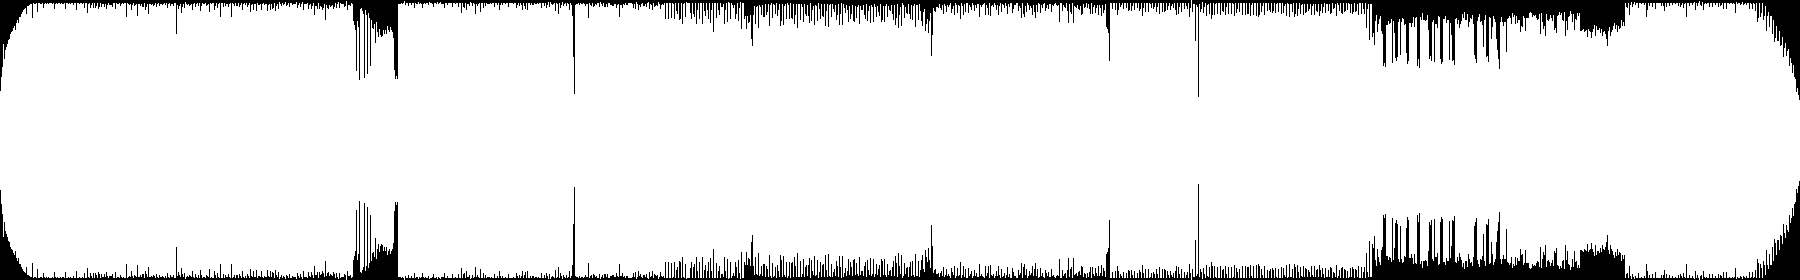 Interstellar Psytrance audio waveform